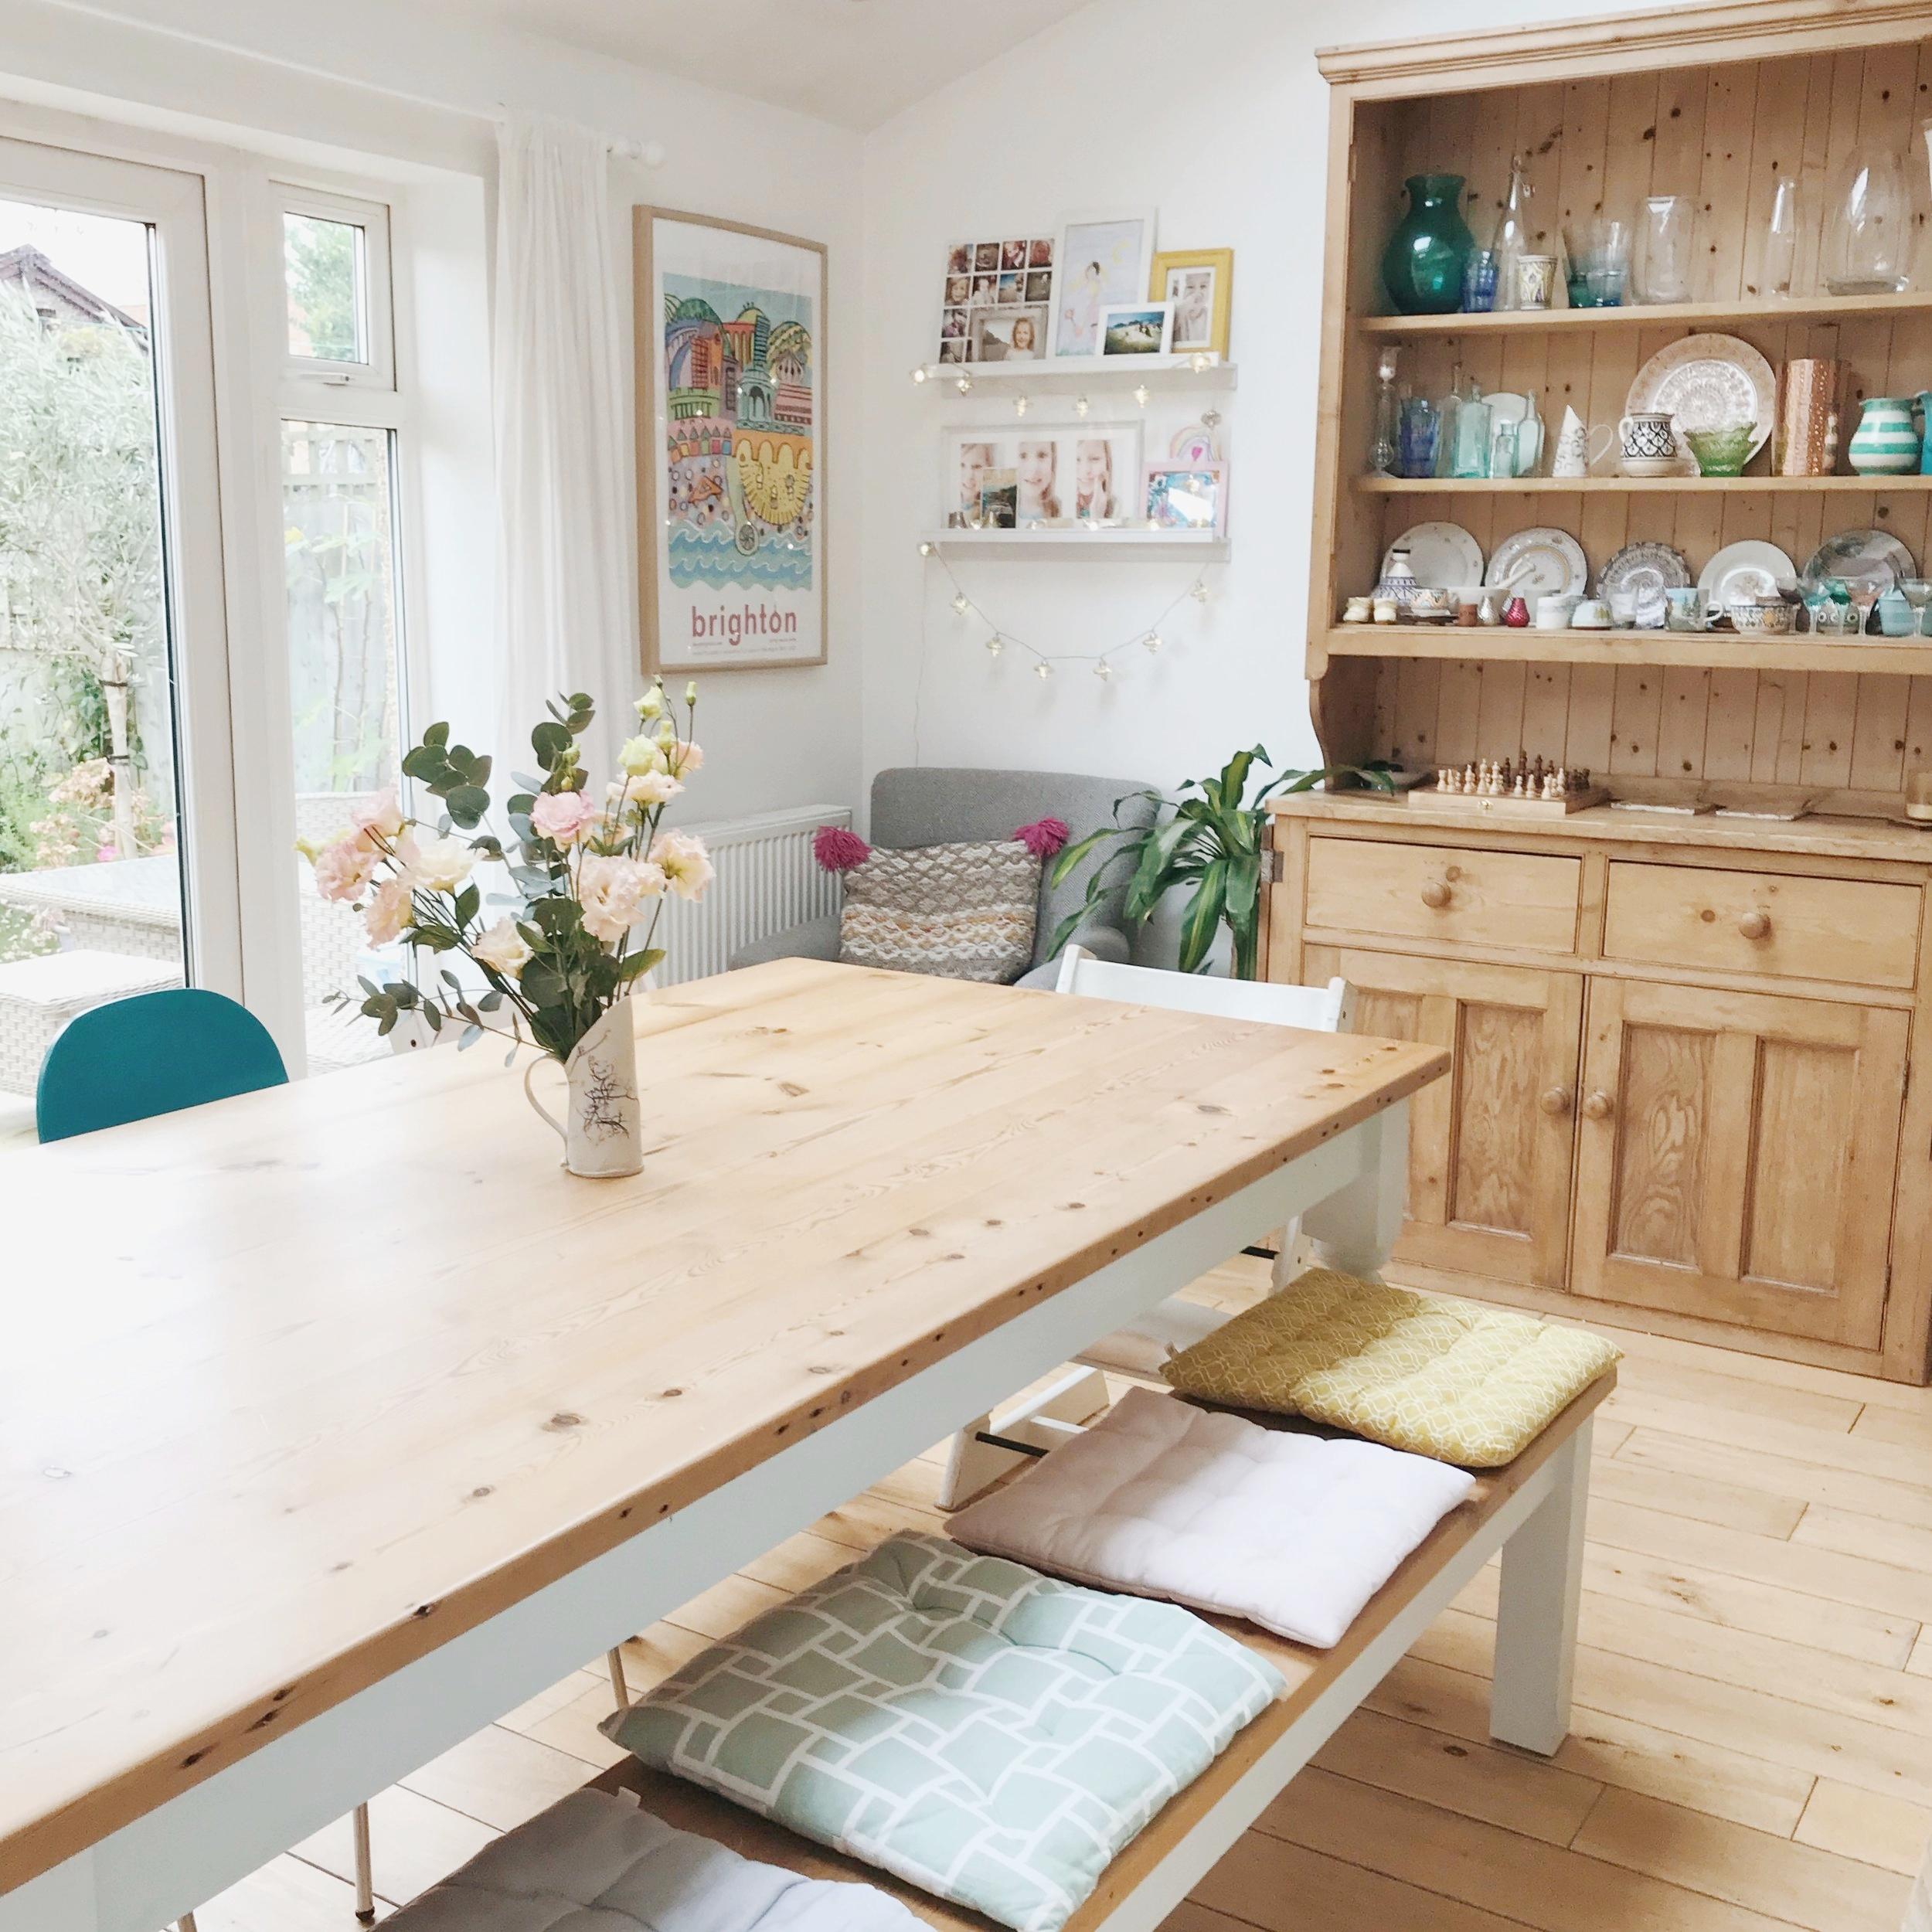 family_kitchen_seating.jpg